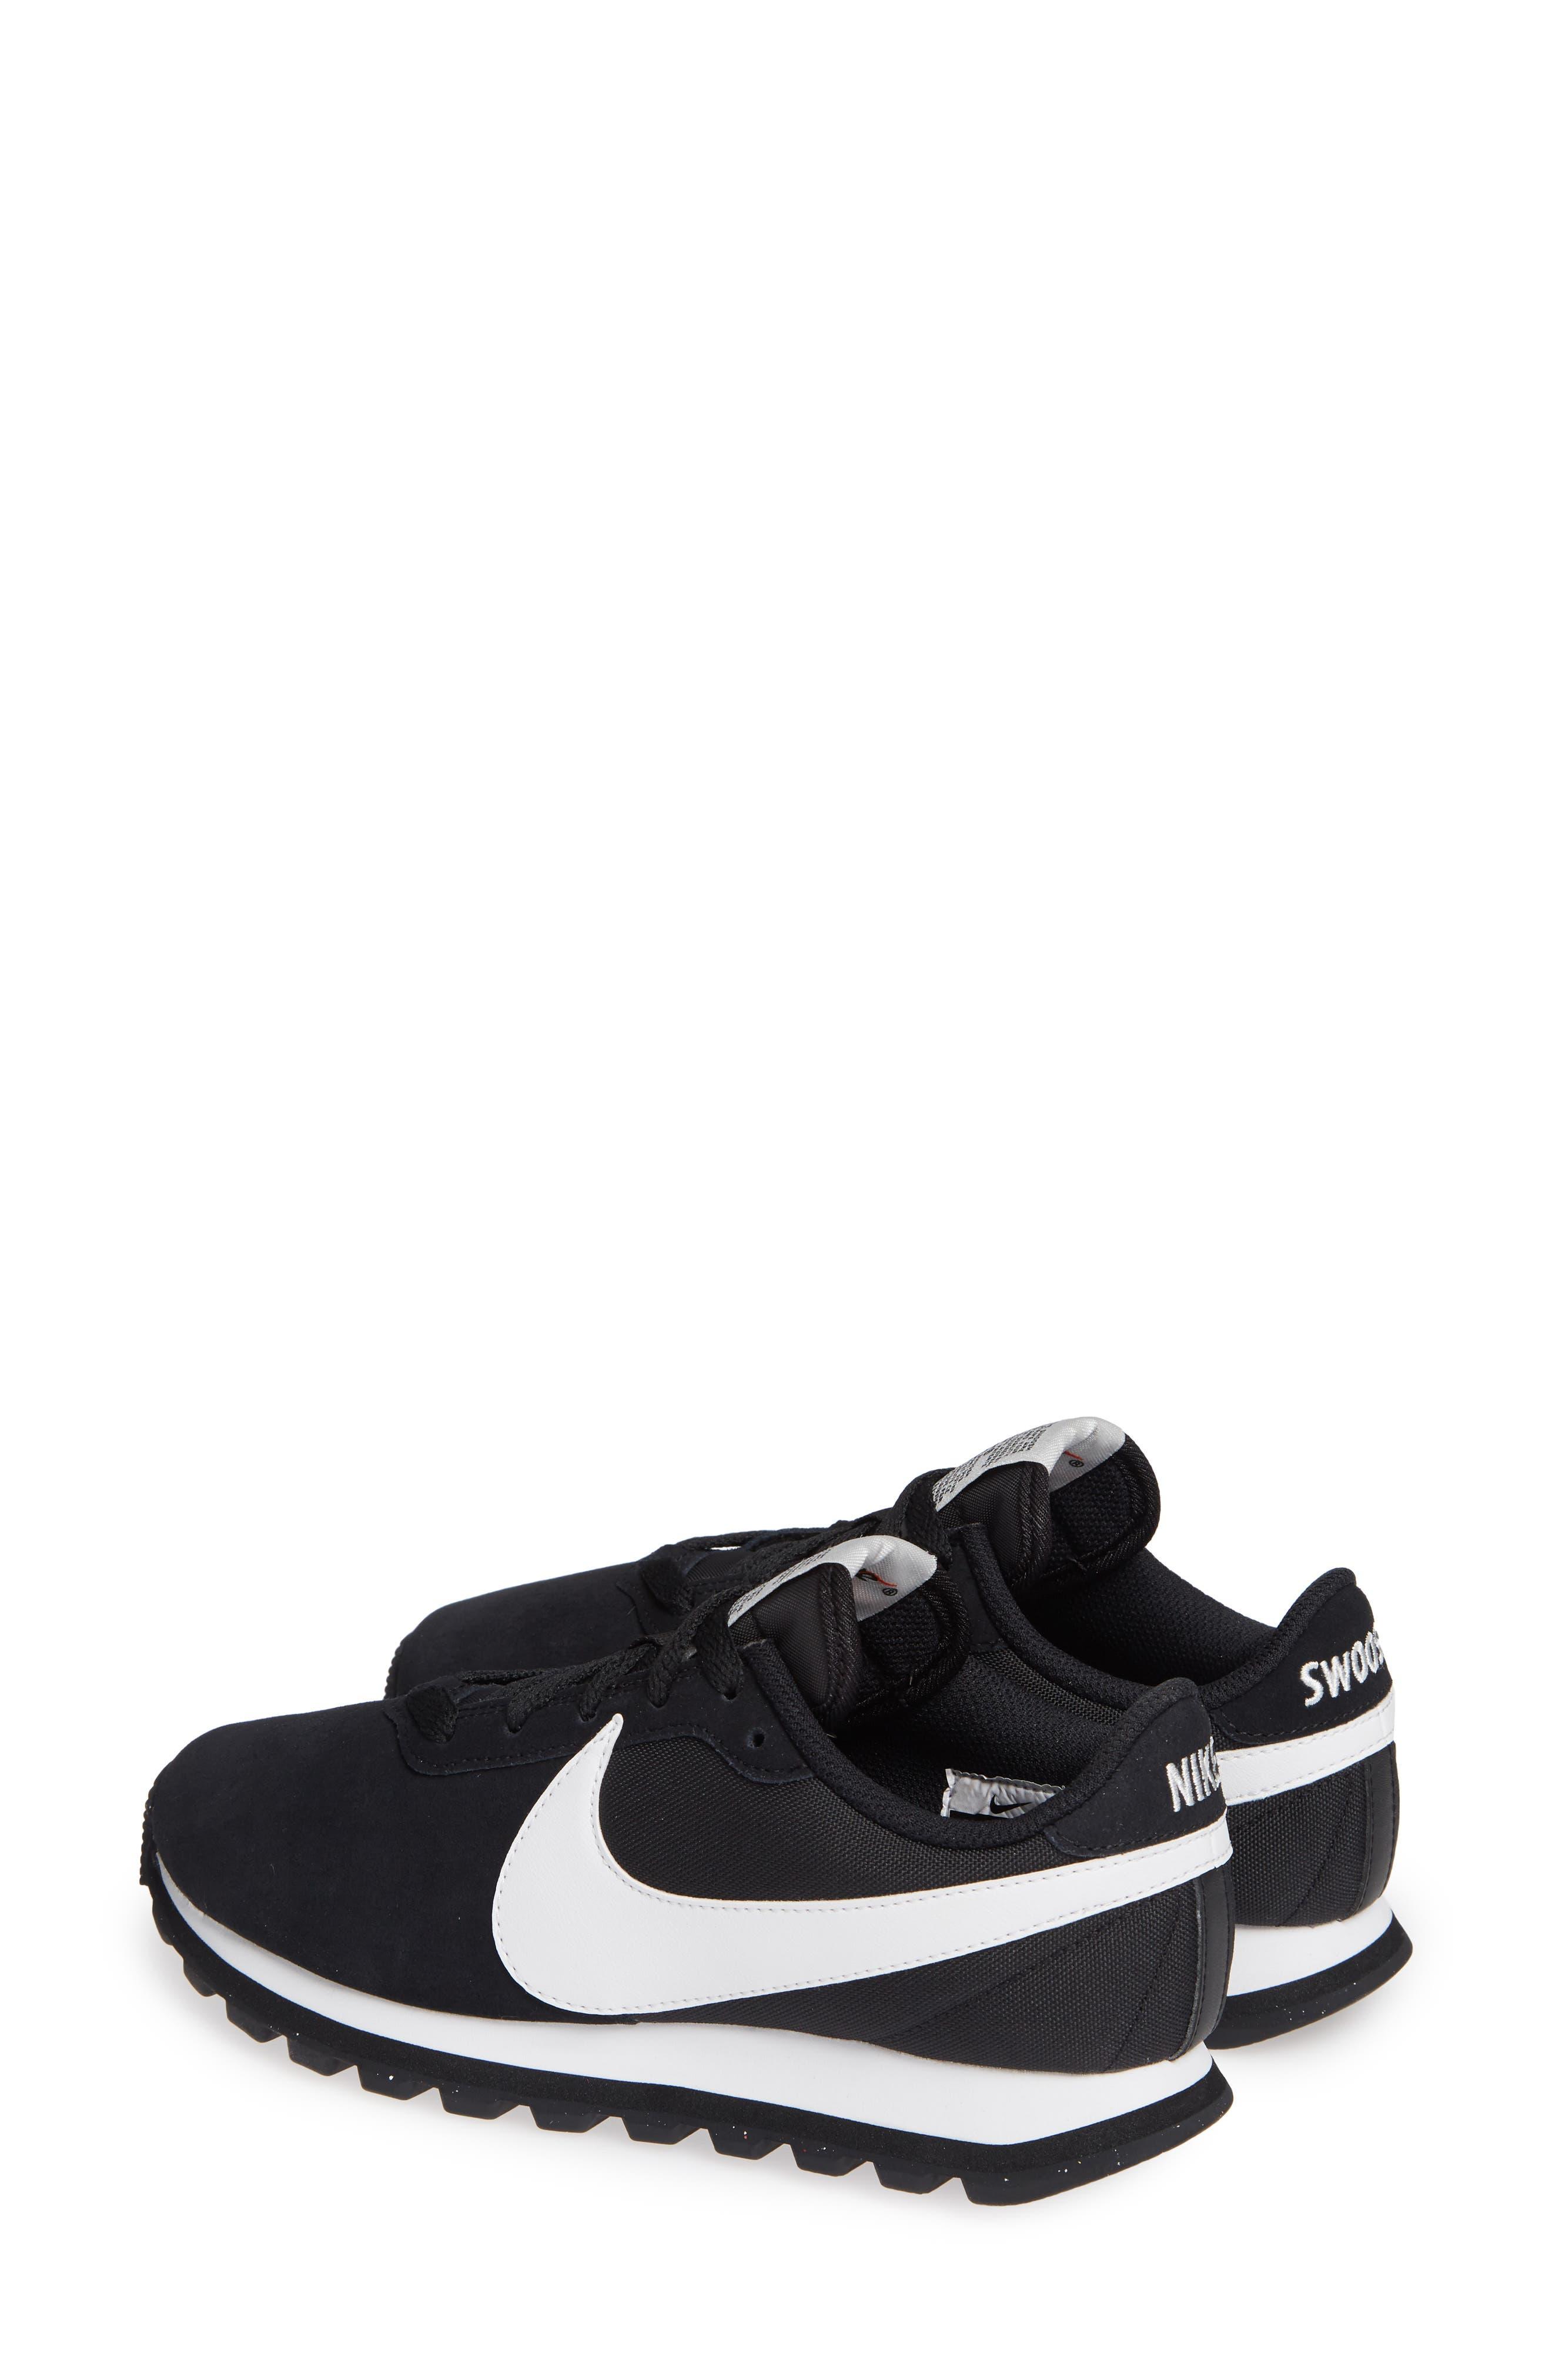 Pre Love O.X. Sneaker,                             Alternate thumbnail 3, color,                             BLACK/ SUMMIT WHITE